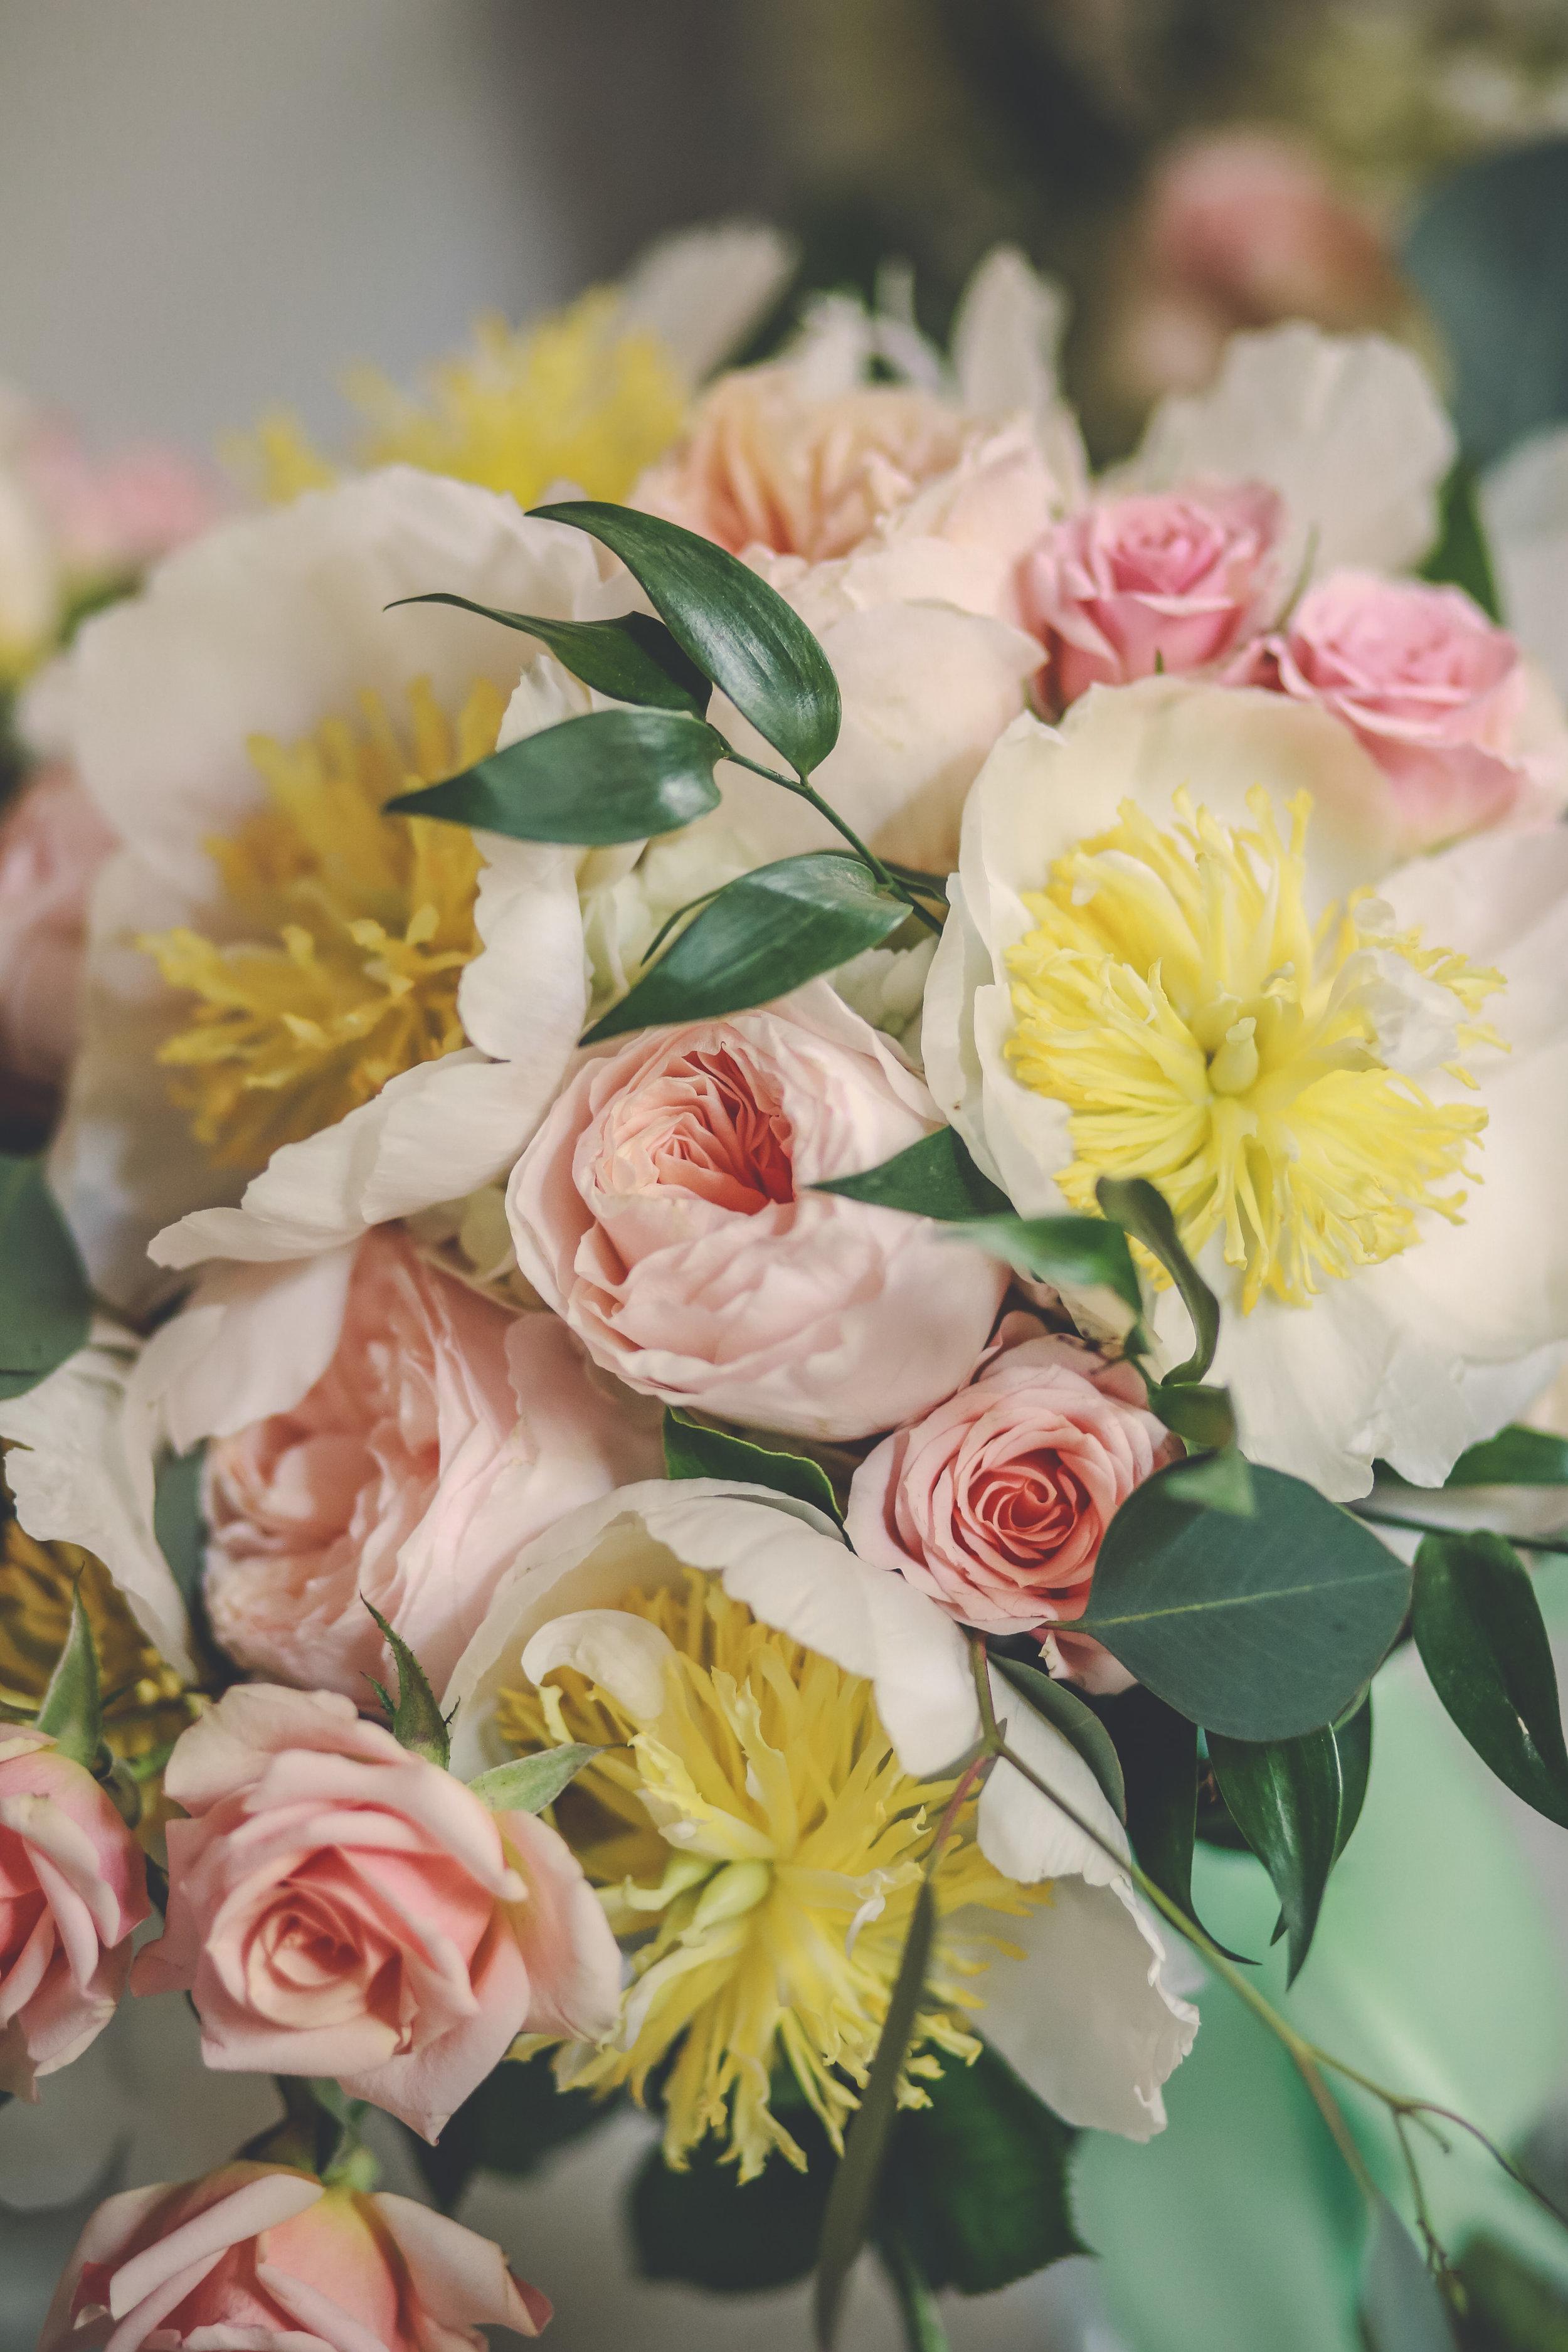 Natasha Naomi Photography -Dresson wedding 2017-0800-2.jpg